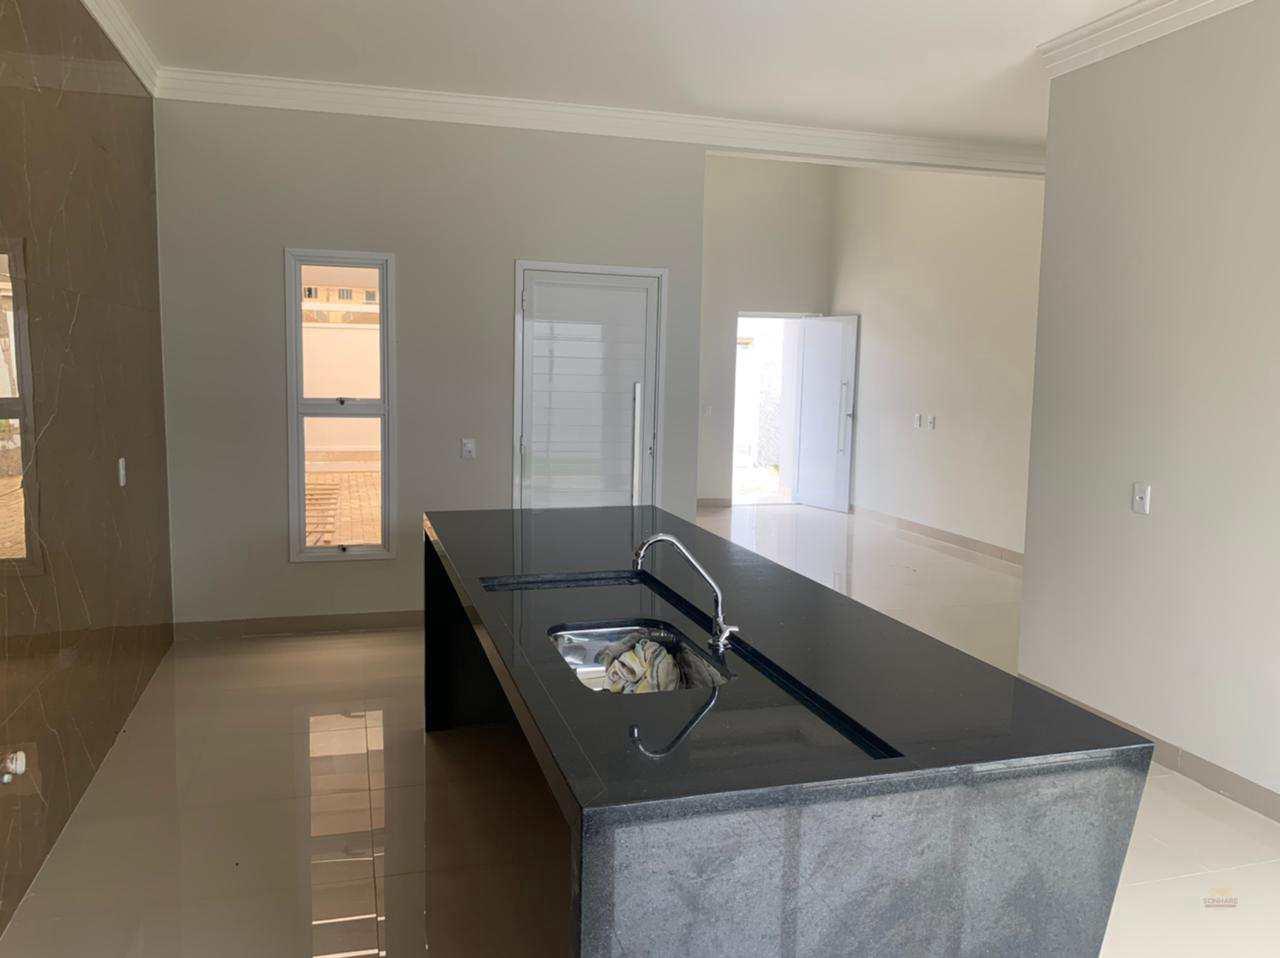 Casa com 2 dorms, Buritis II, Primavera do Leste - R$ 420 mil, Cod: 388